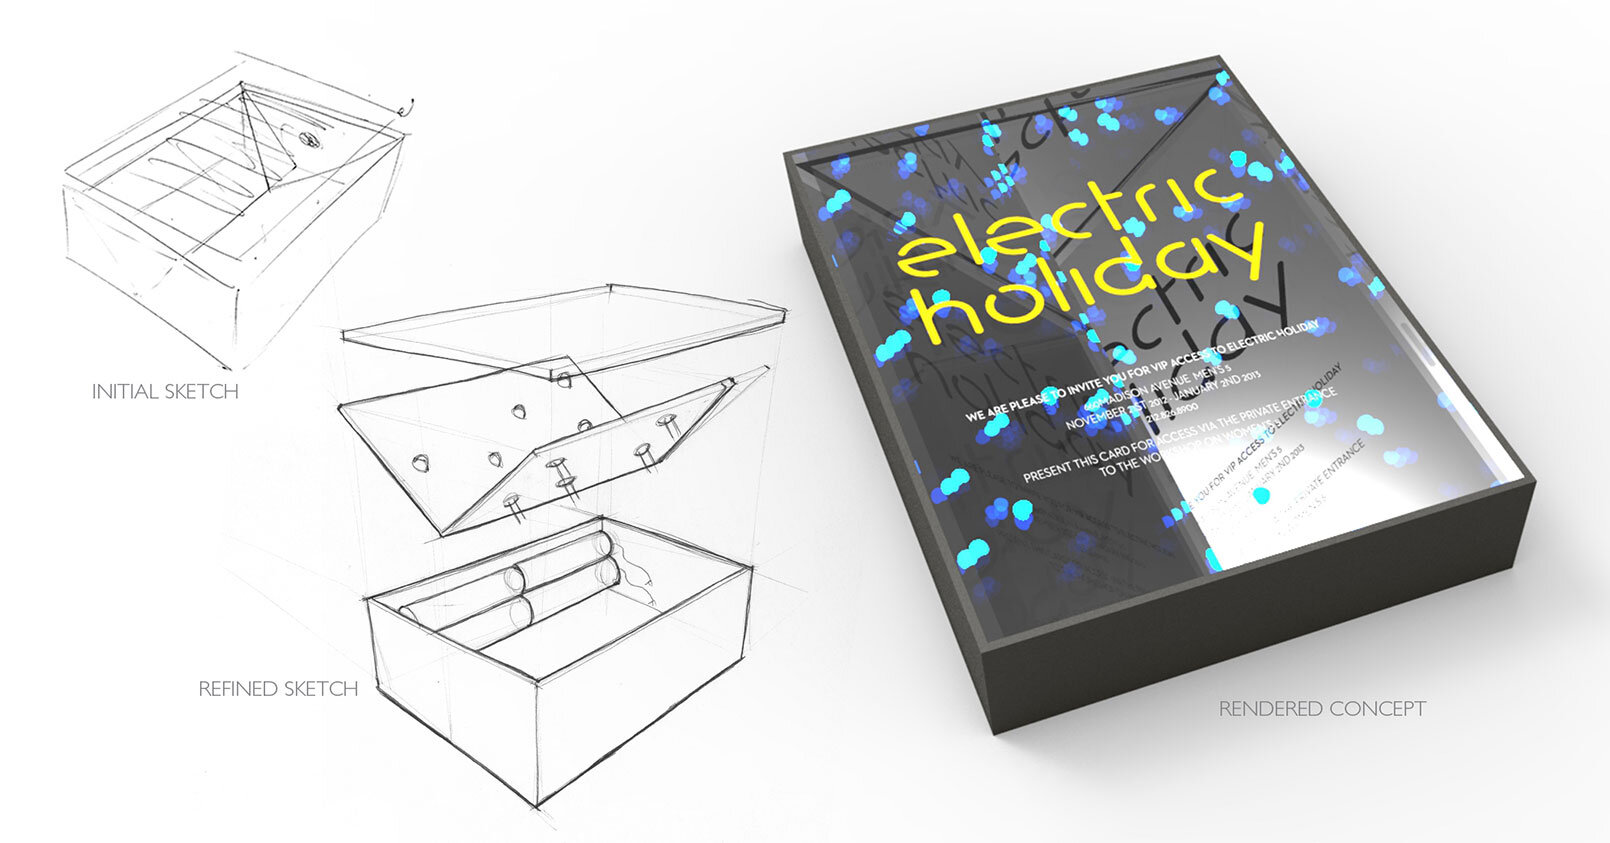 Barneys-New-York-Disney-Holiday-Packaging-Company-Design-2.JPG